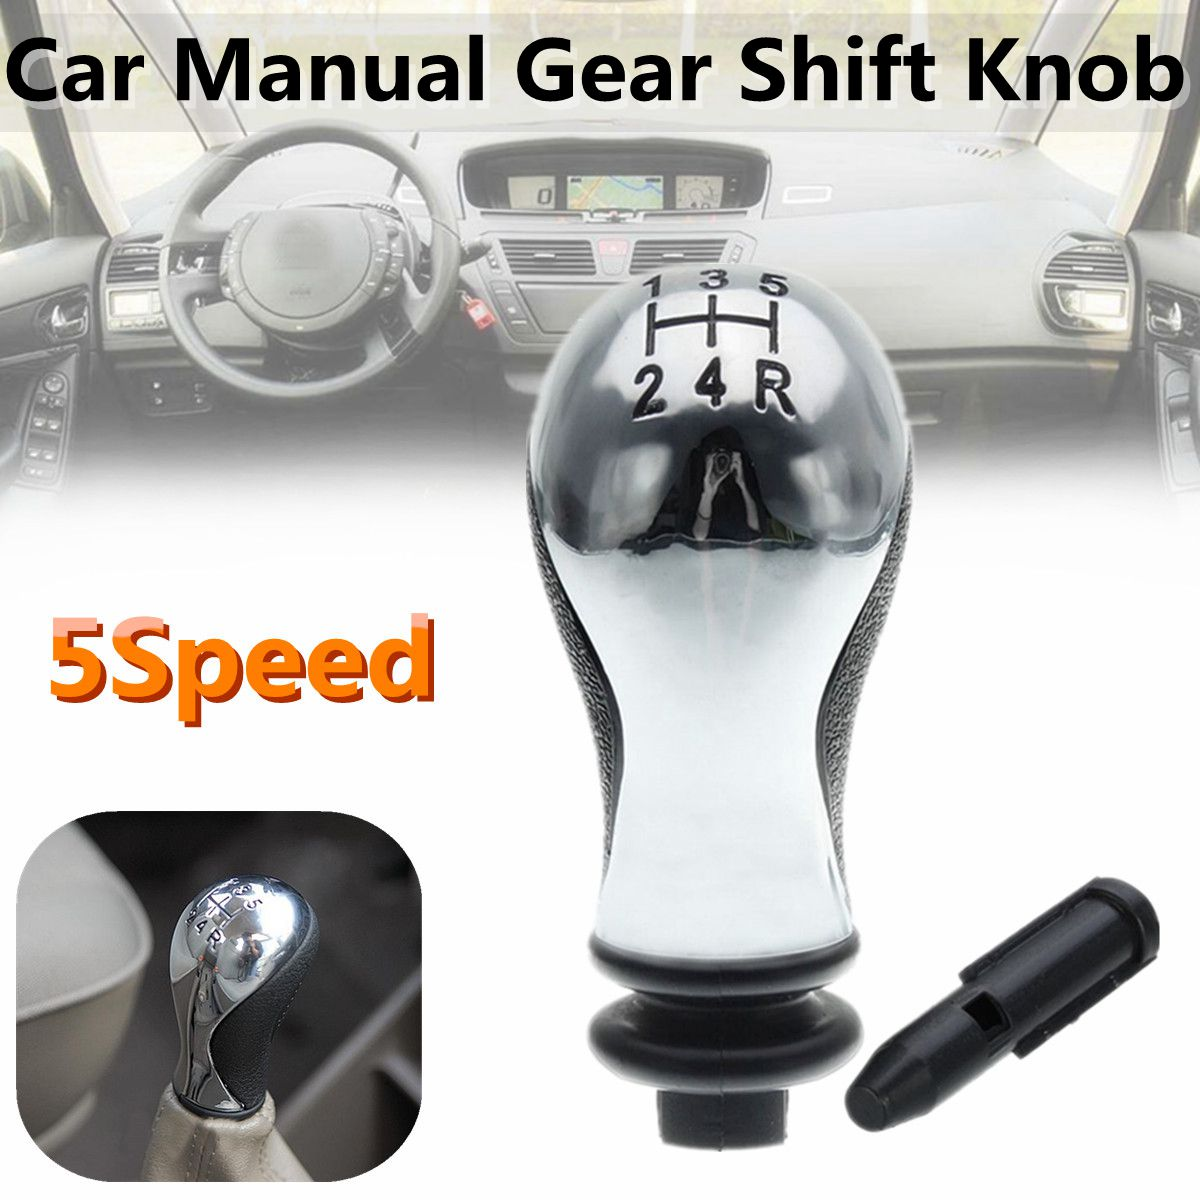 5 Speed Manual Car Gear Shift Knob For Citroen C5 01-08